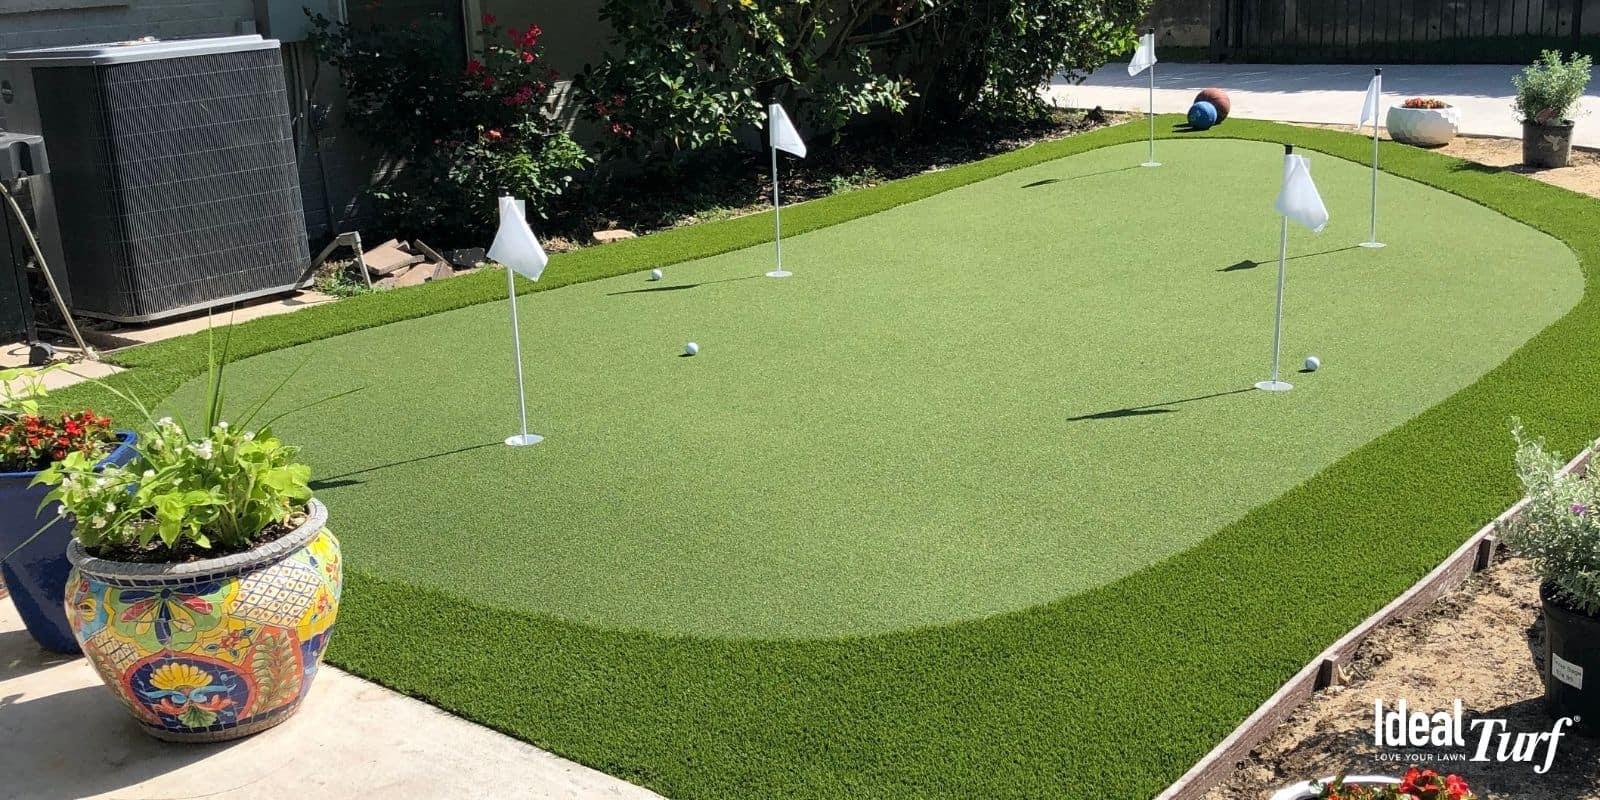 2. Man Using Backyard Putting Green